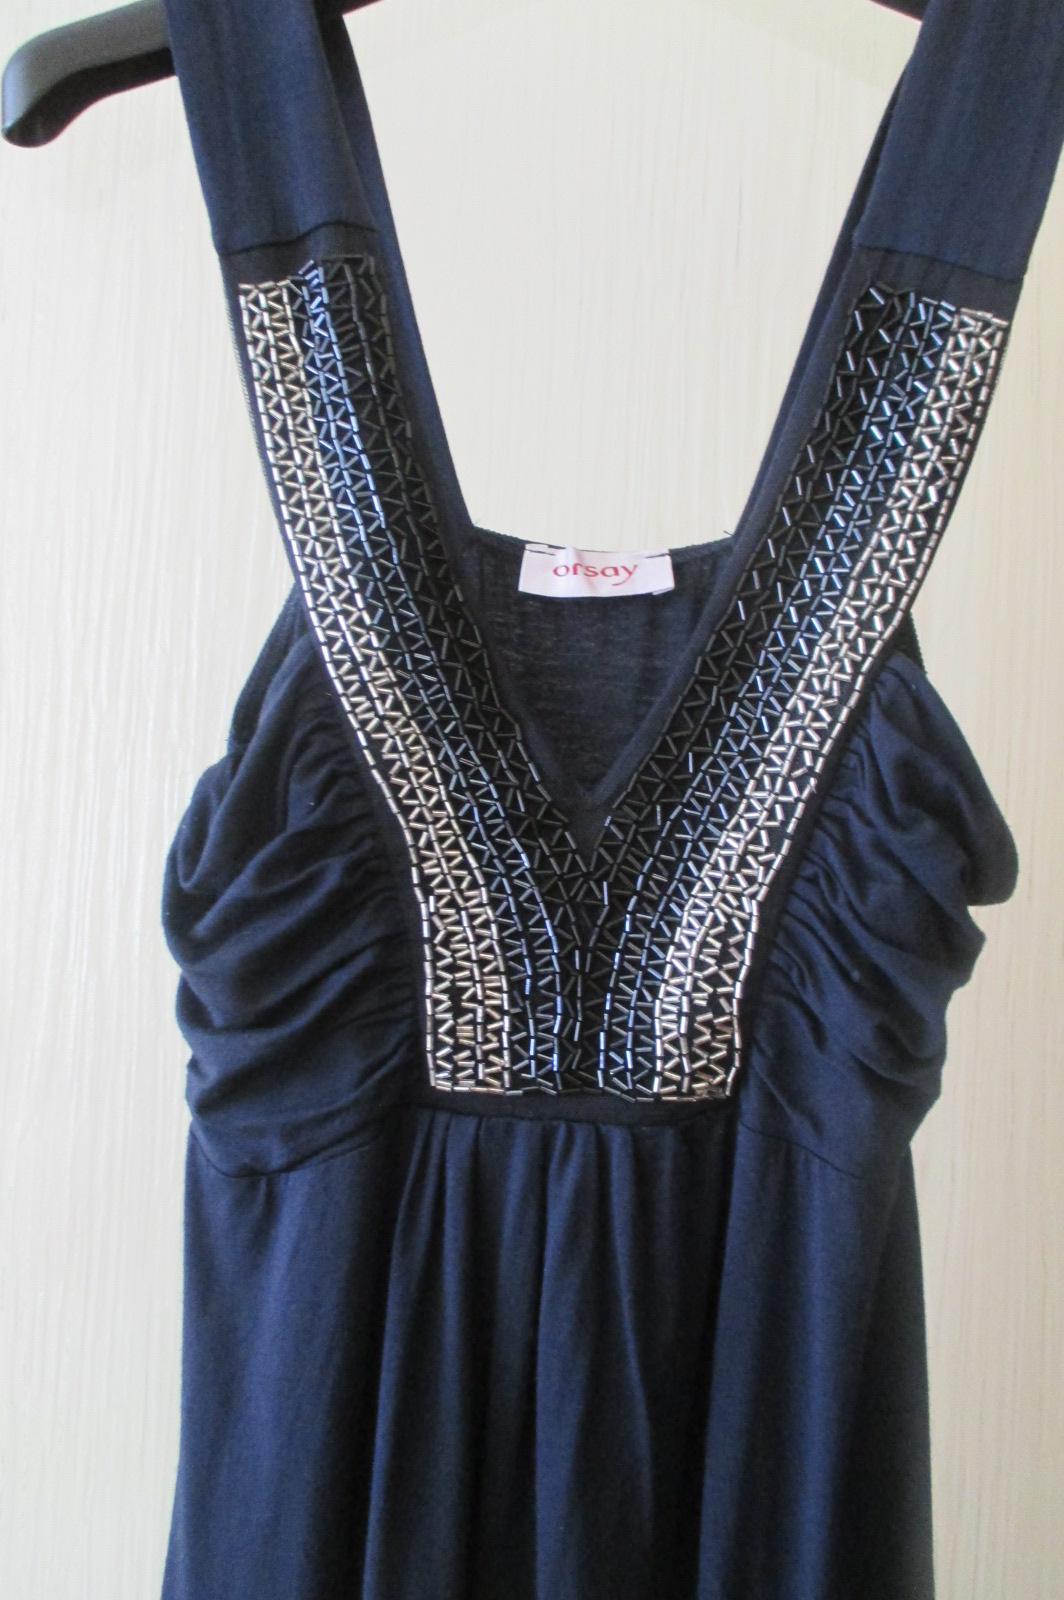 šaty orsay - Obrázok č. 2